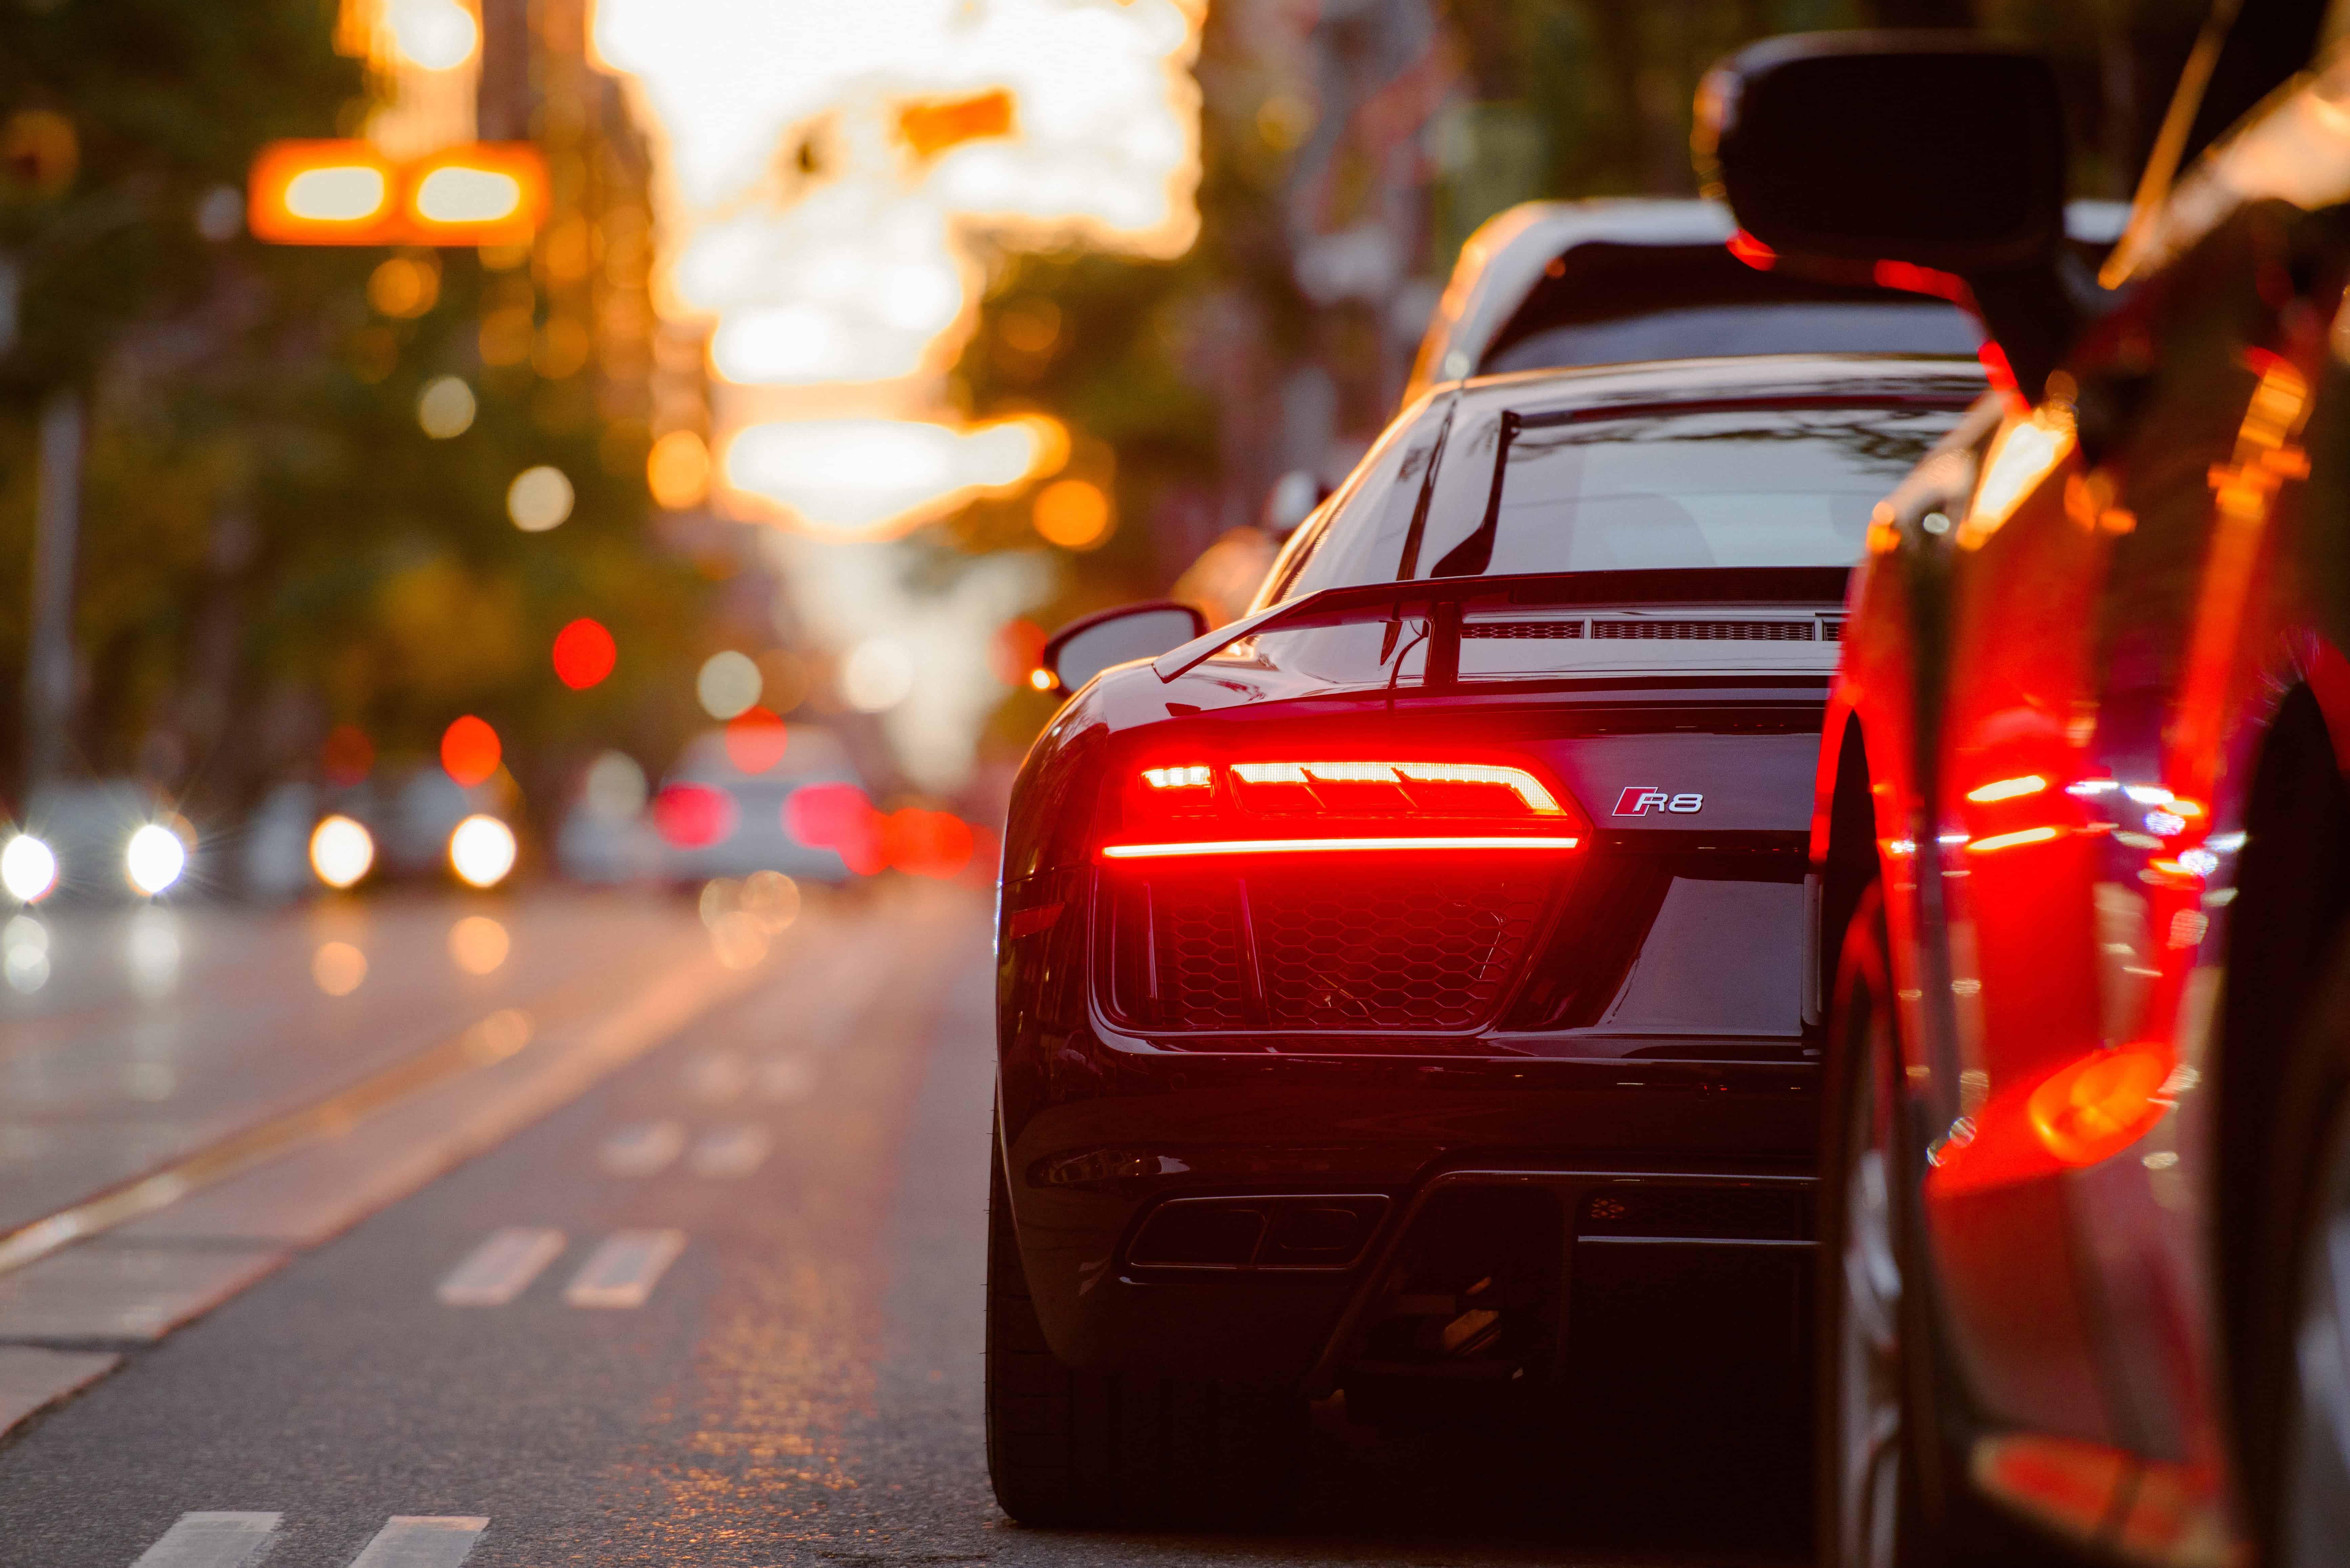 costul unei asigurari auto in UK